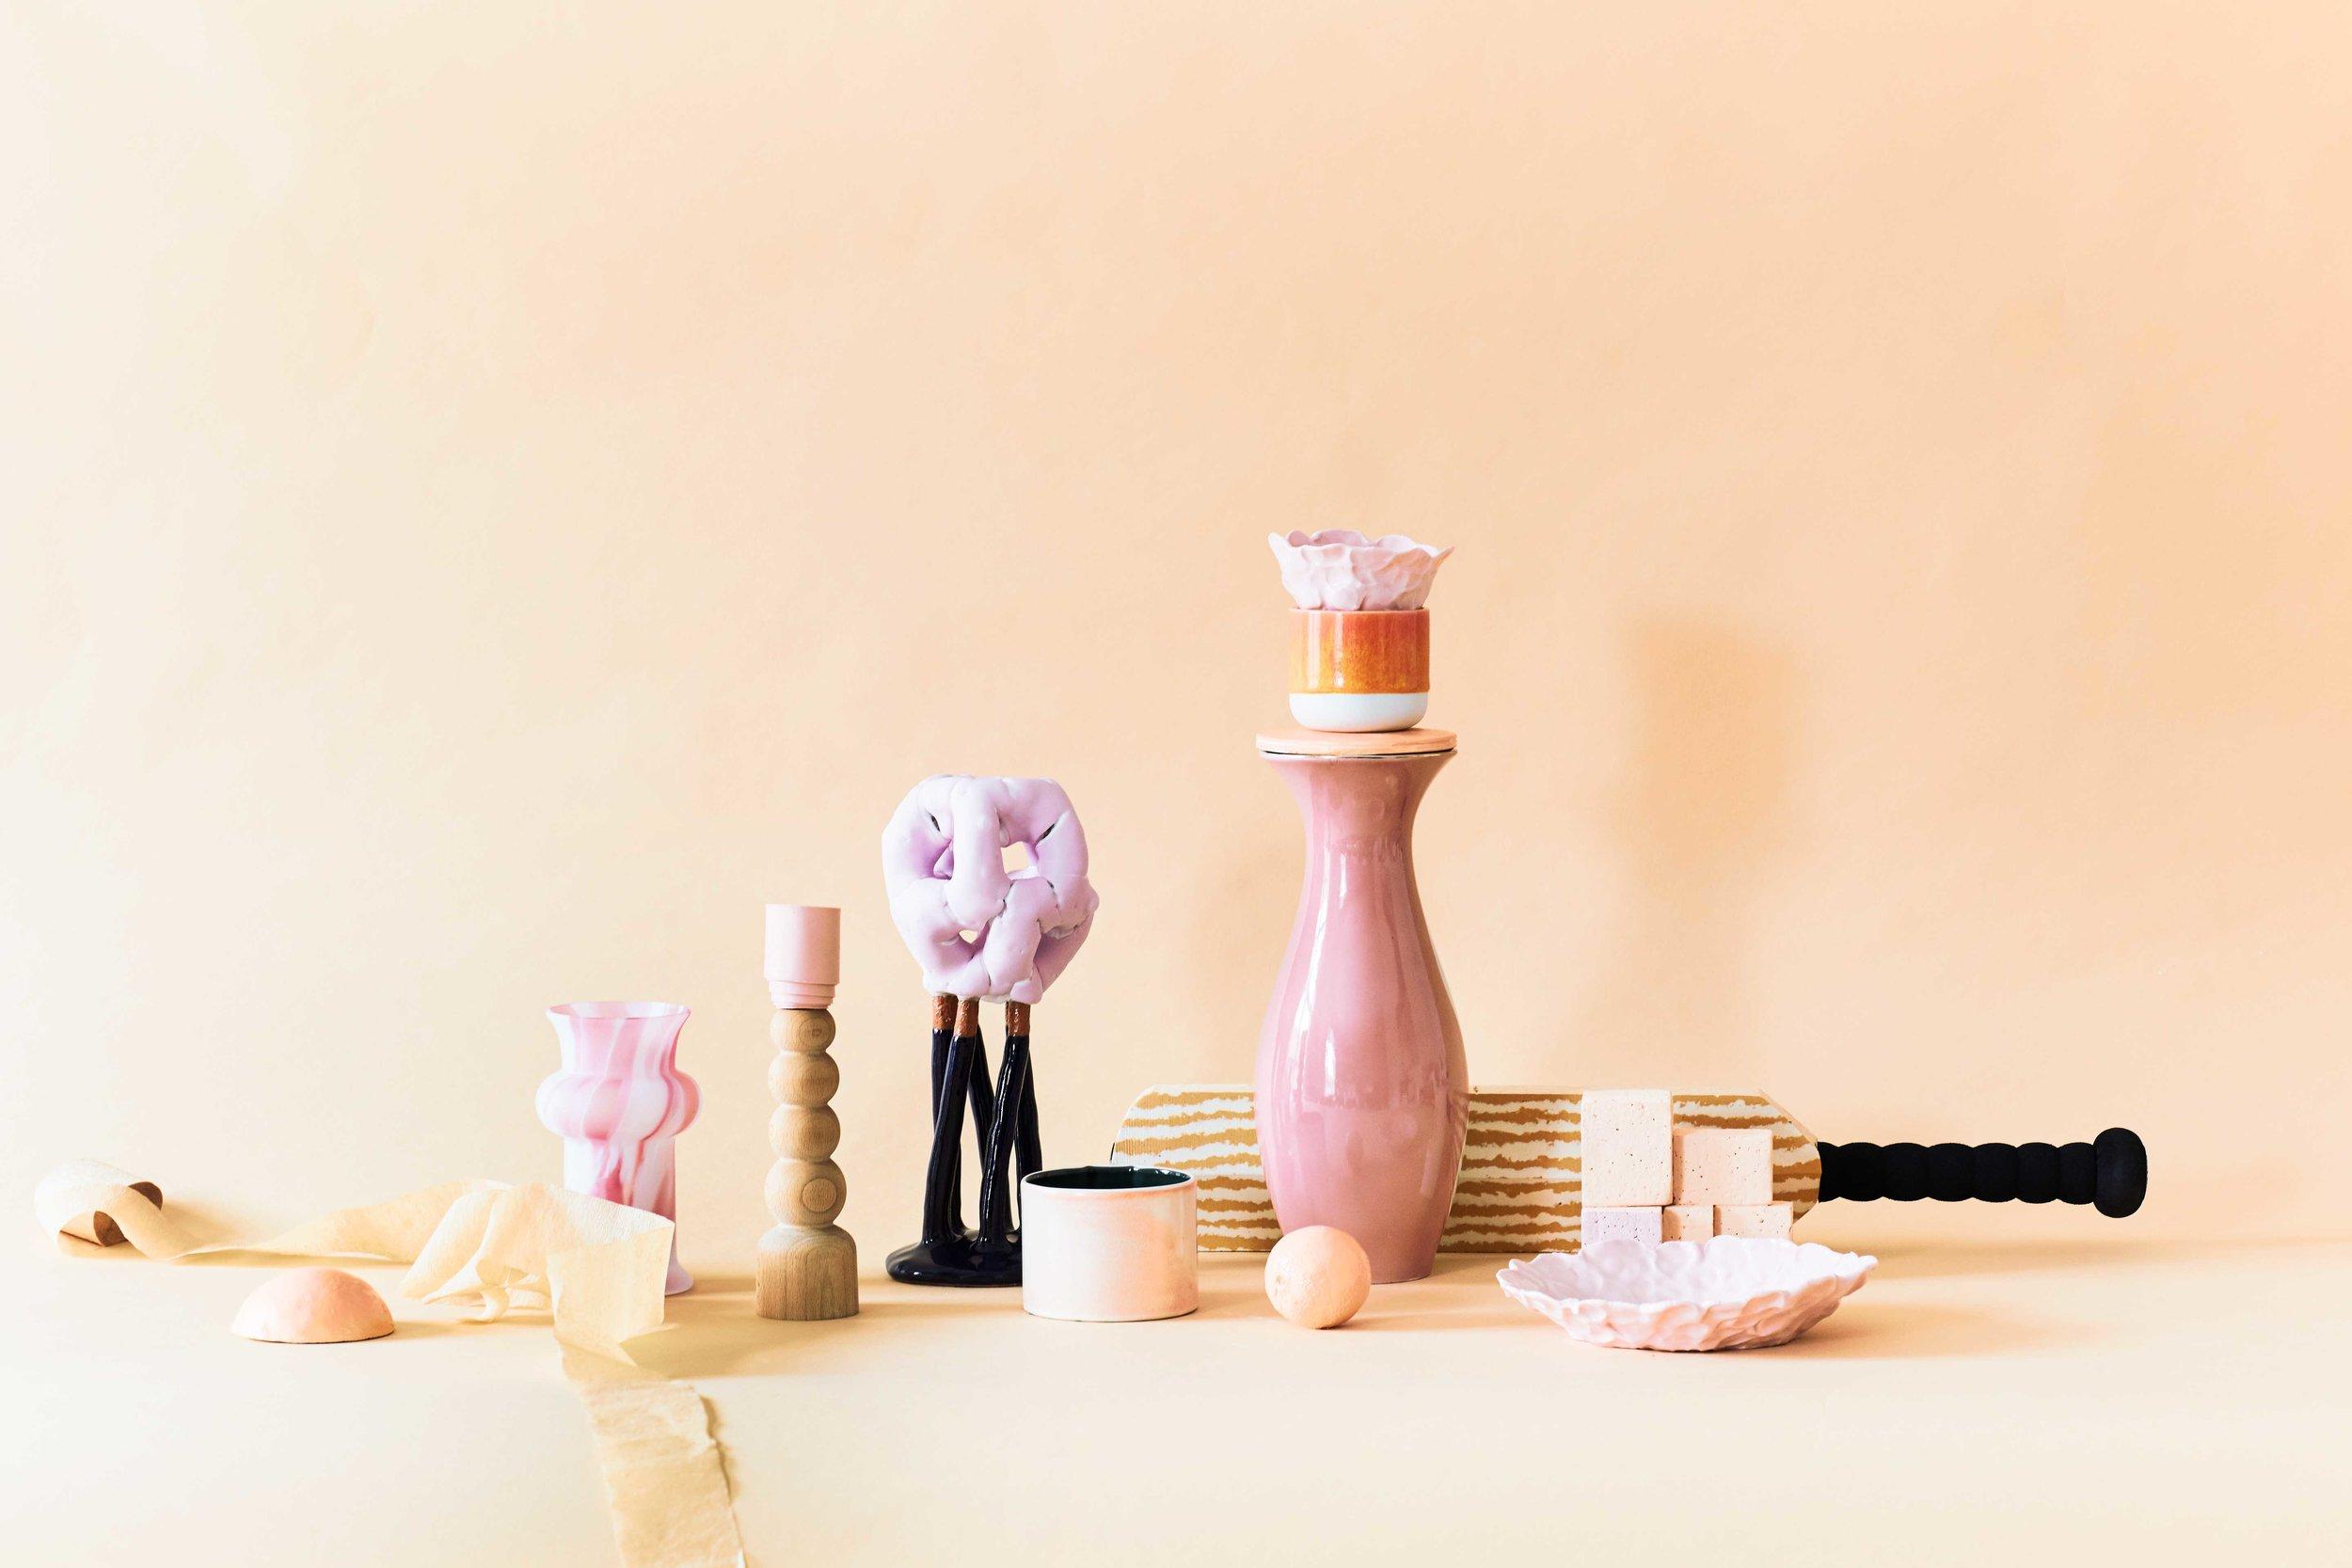 //pink    Glass vase Padmo & Vig / Candlestick Yonobi Studio / Podium, tree, Panduro Hobby / Sculpture Bente Skjoettgaard / Mug Claydies / Bowl ( on top) Claydies / Bowl, orange Arhøj / Vase Padmo & Vig / Sculpture made of foam private / Bowl Calydies